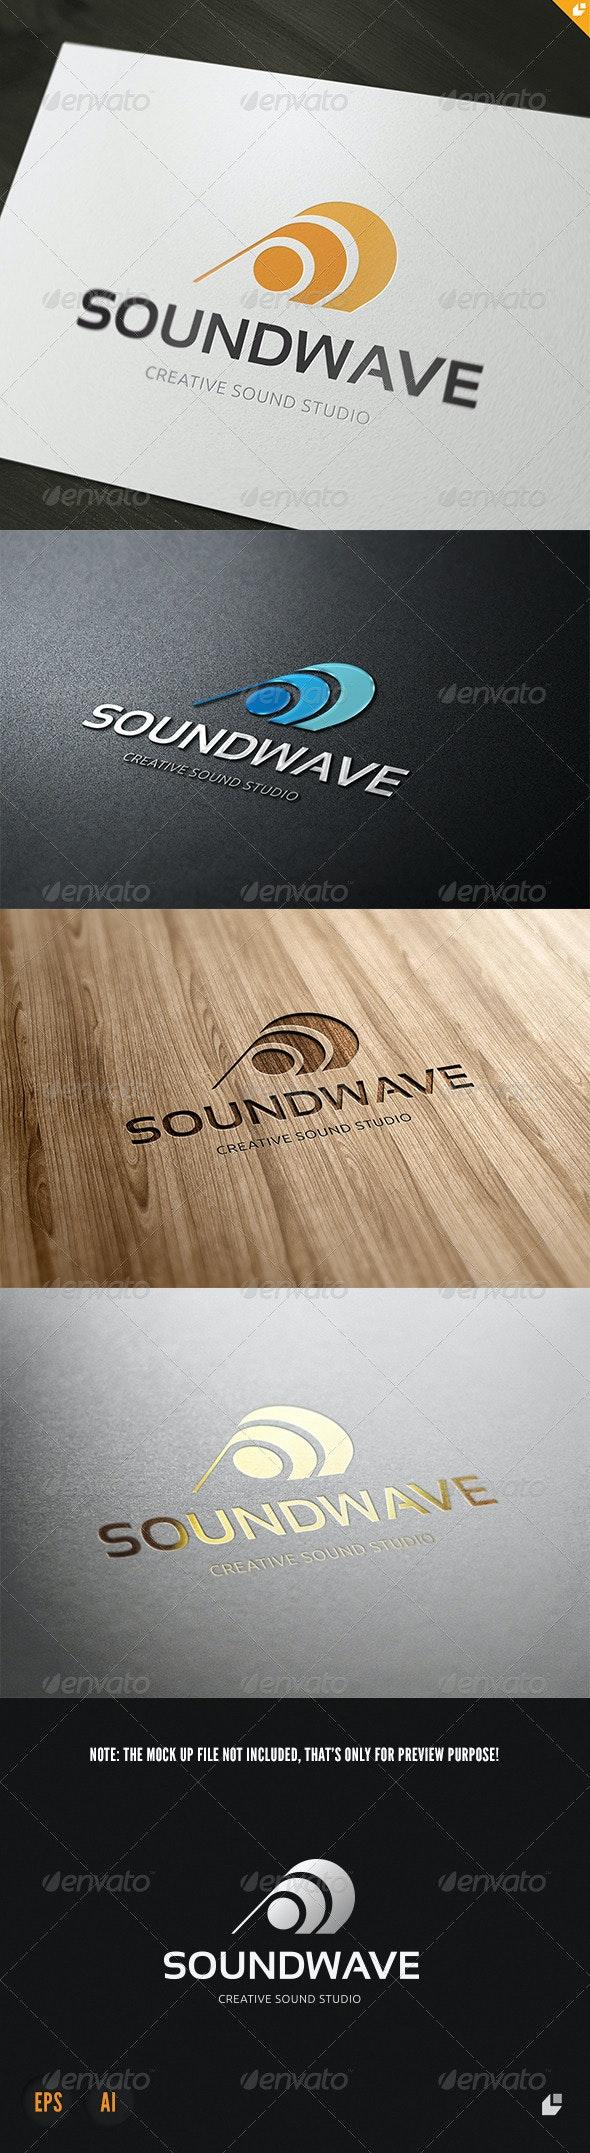 Sound Wave Logo - Vector Abstract